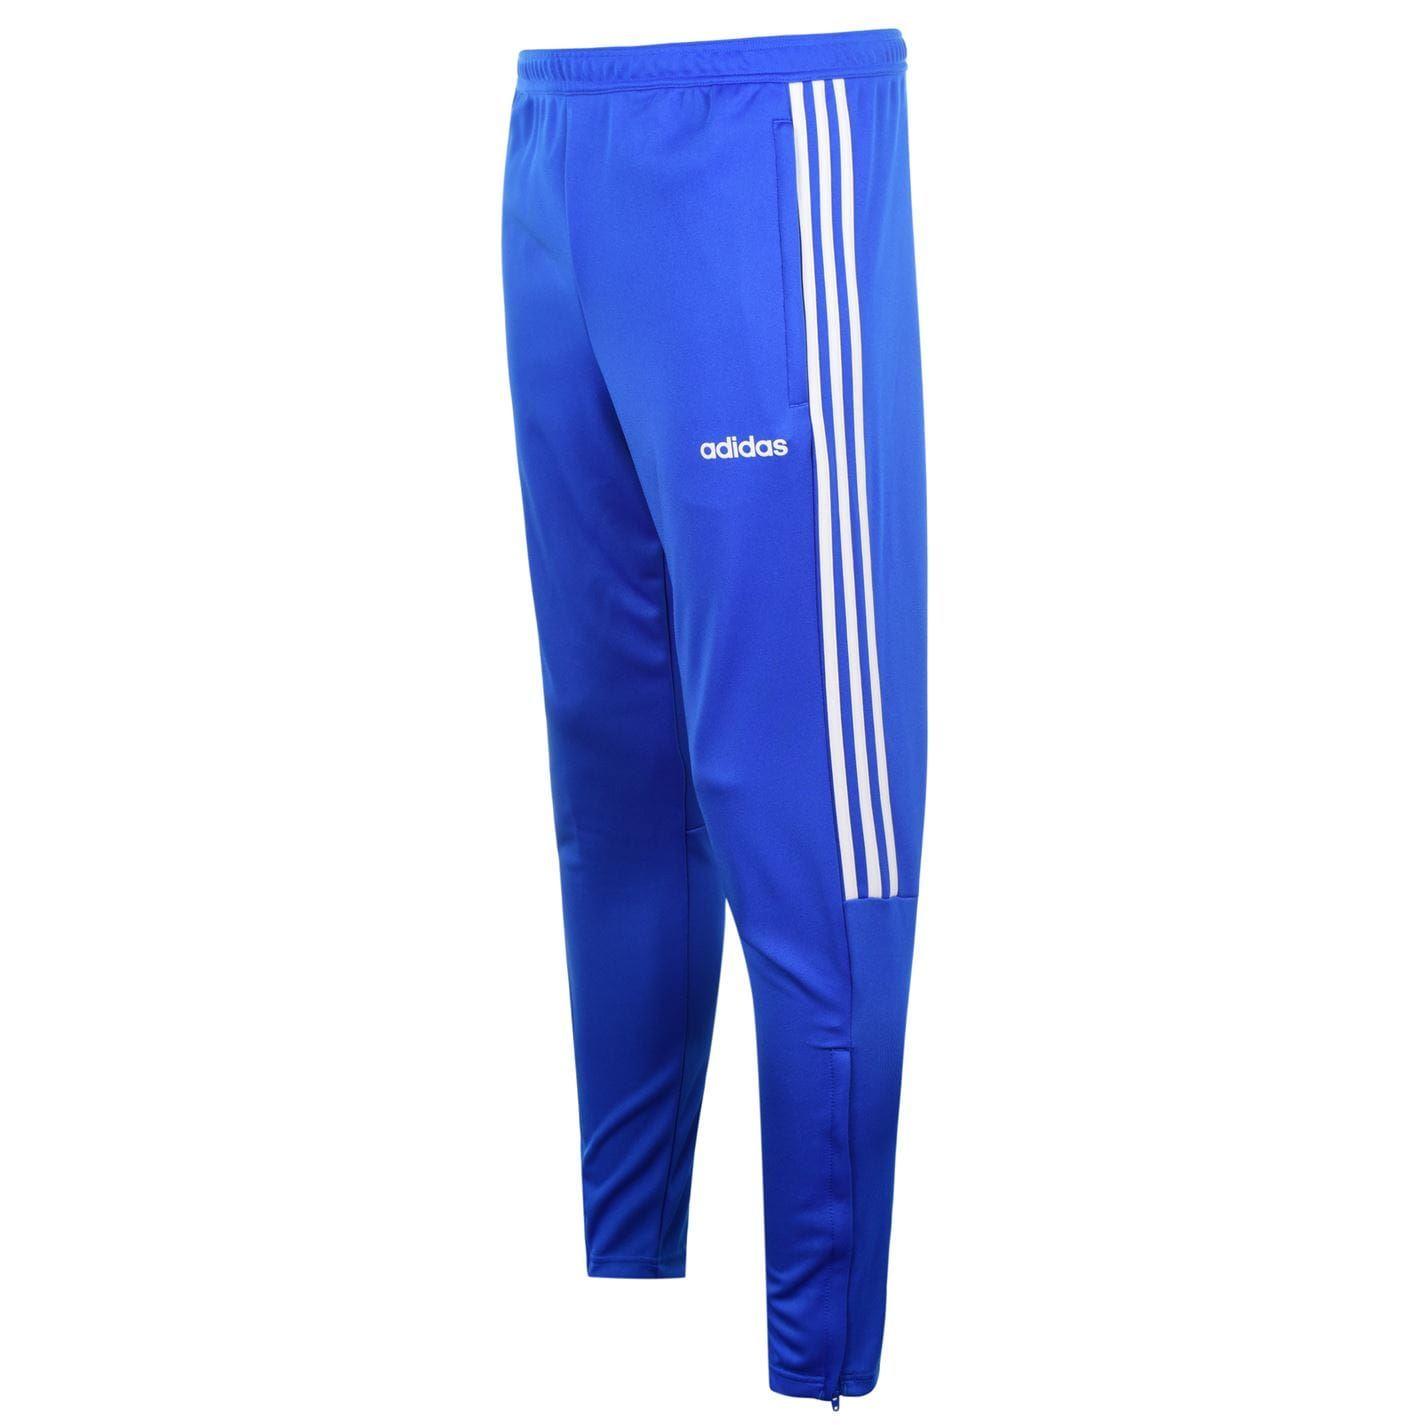 Glamour probable Buscar  adidas Sereno Tracksuit Pants Juniors Royal Football Soccer Track ...